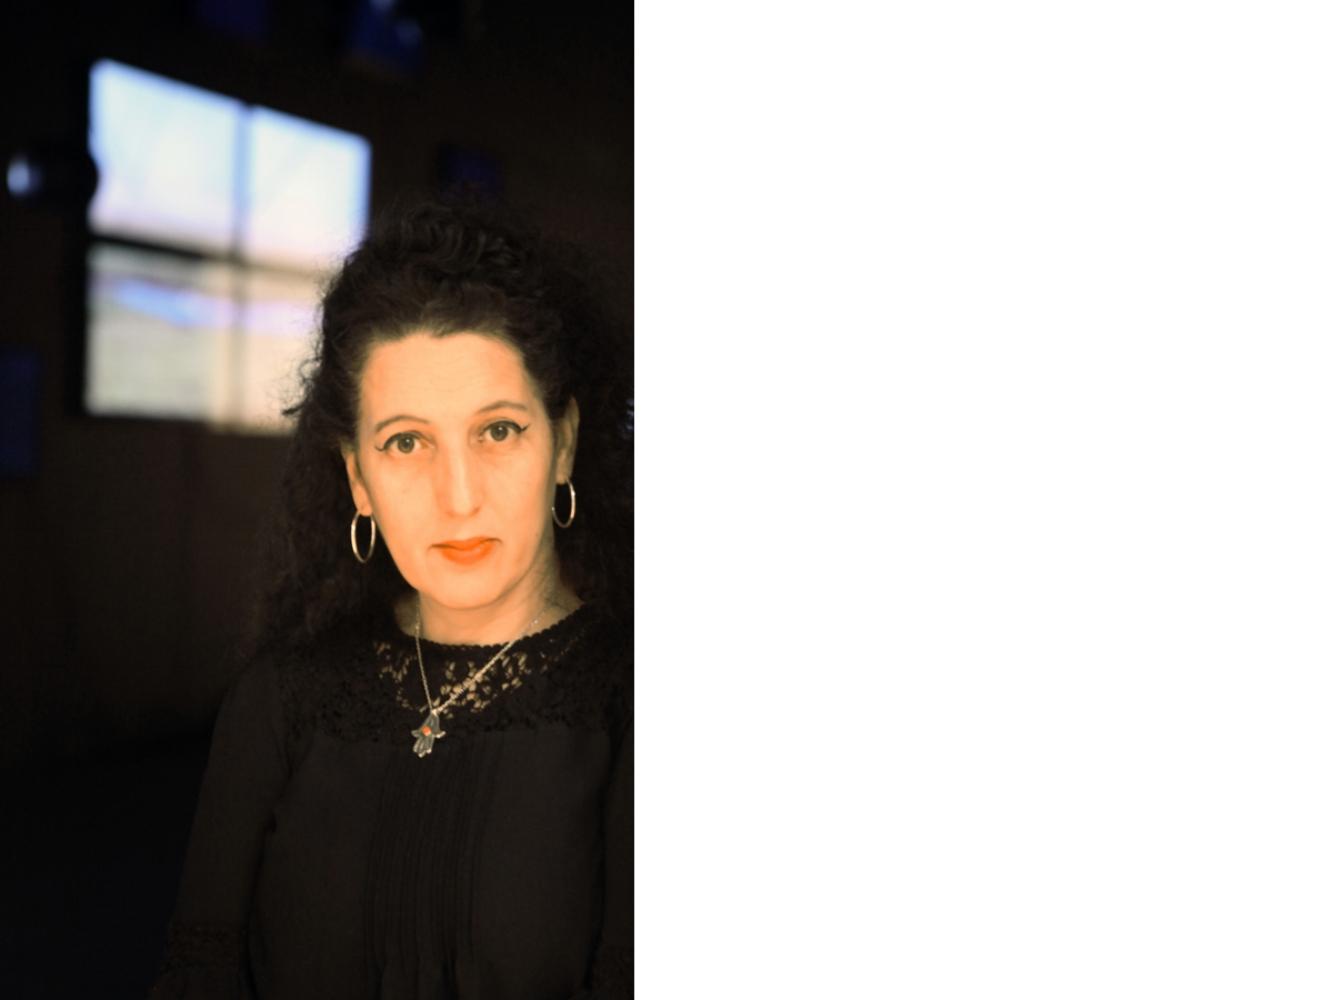 Zineb Sedira / courtesy Sueraya Shaheen